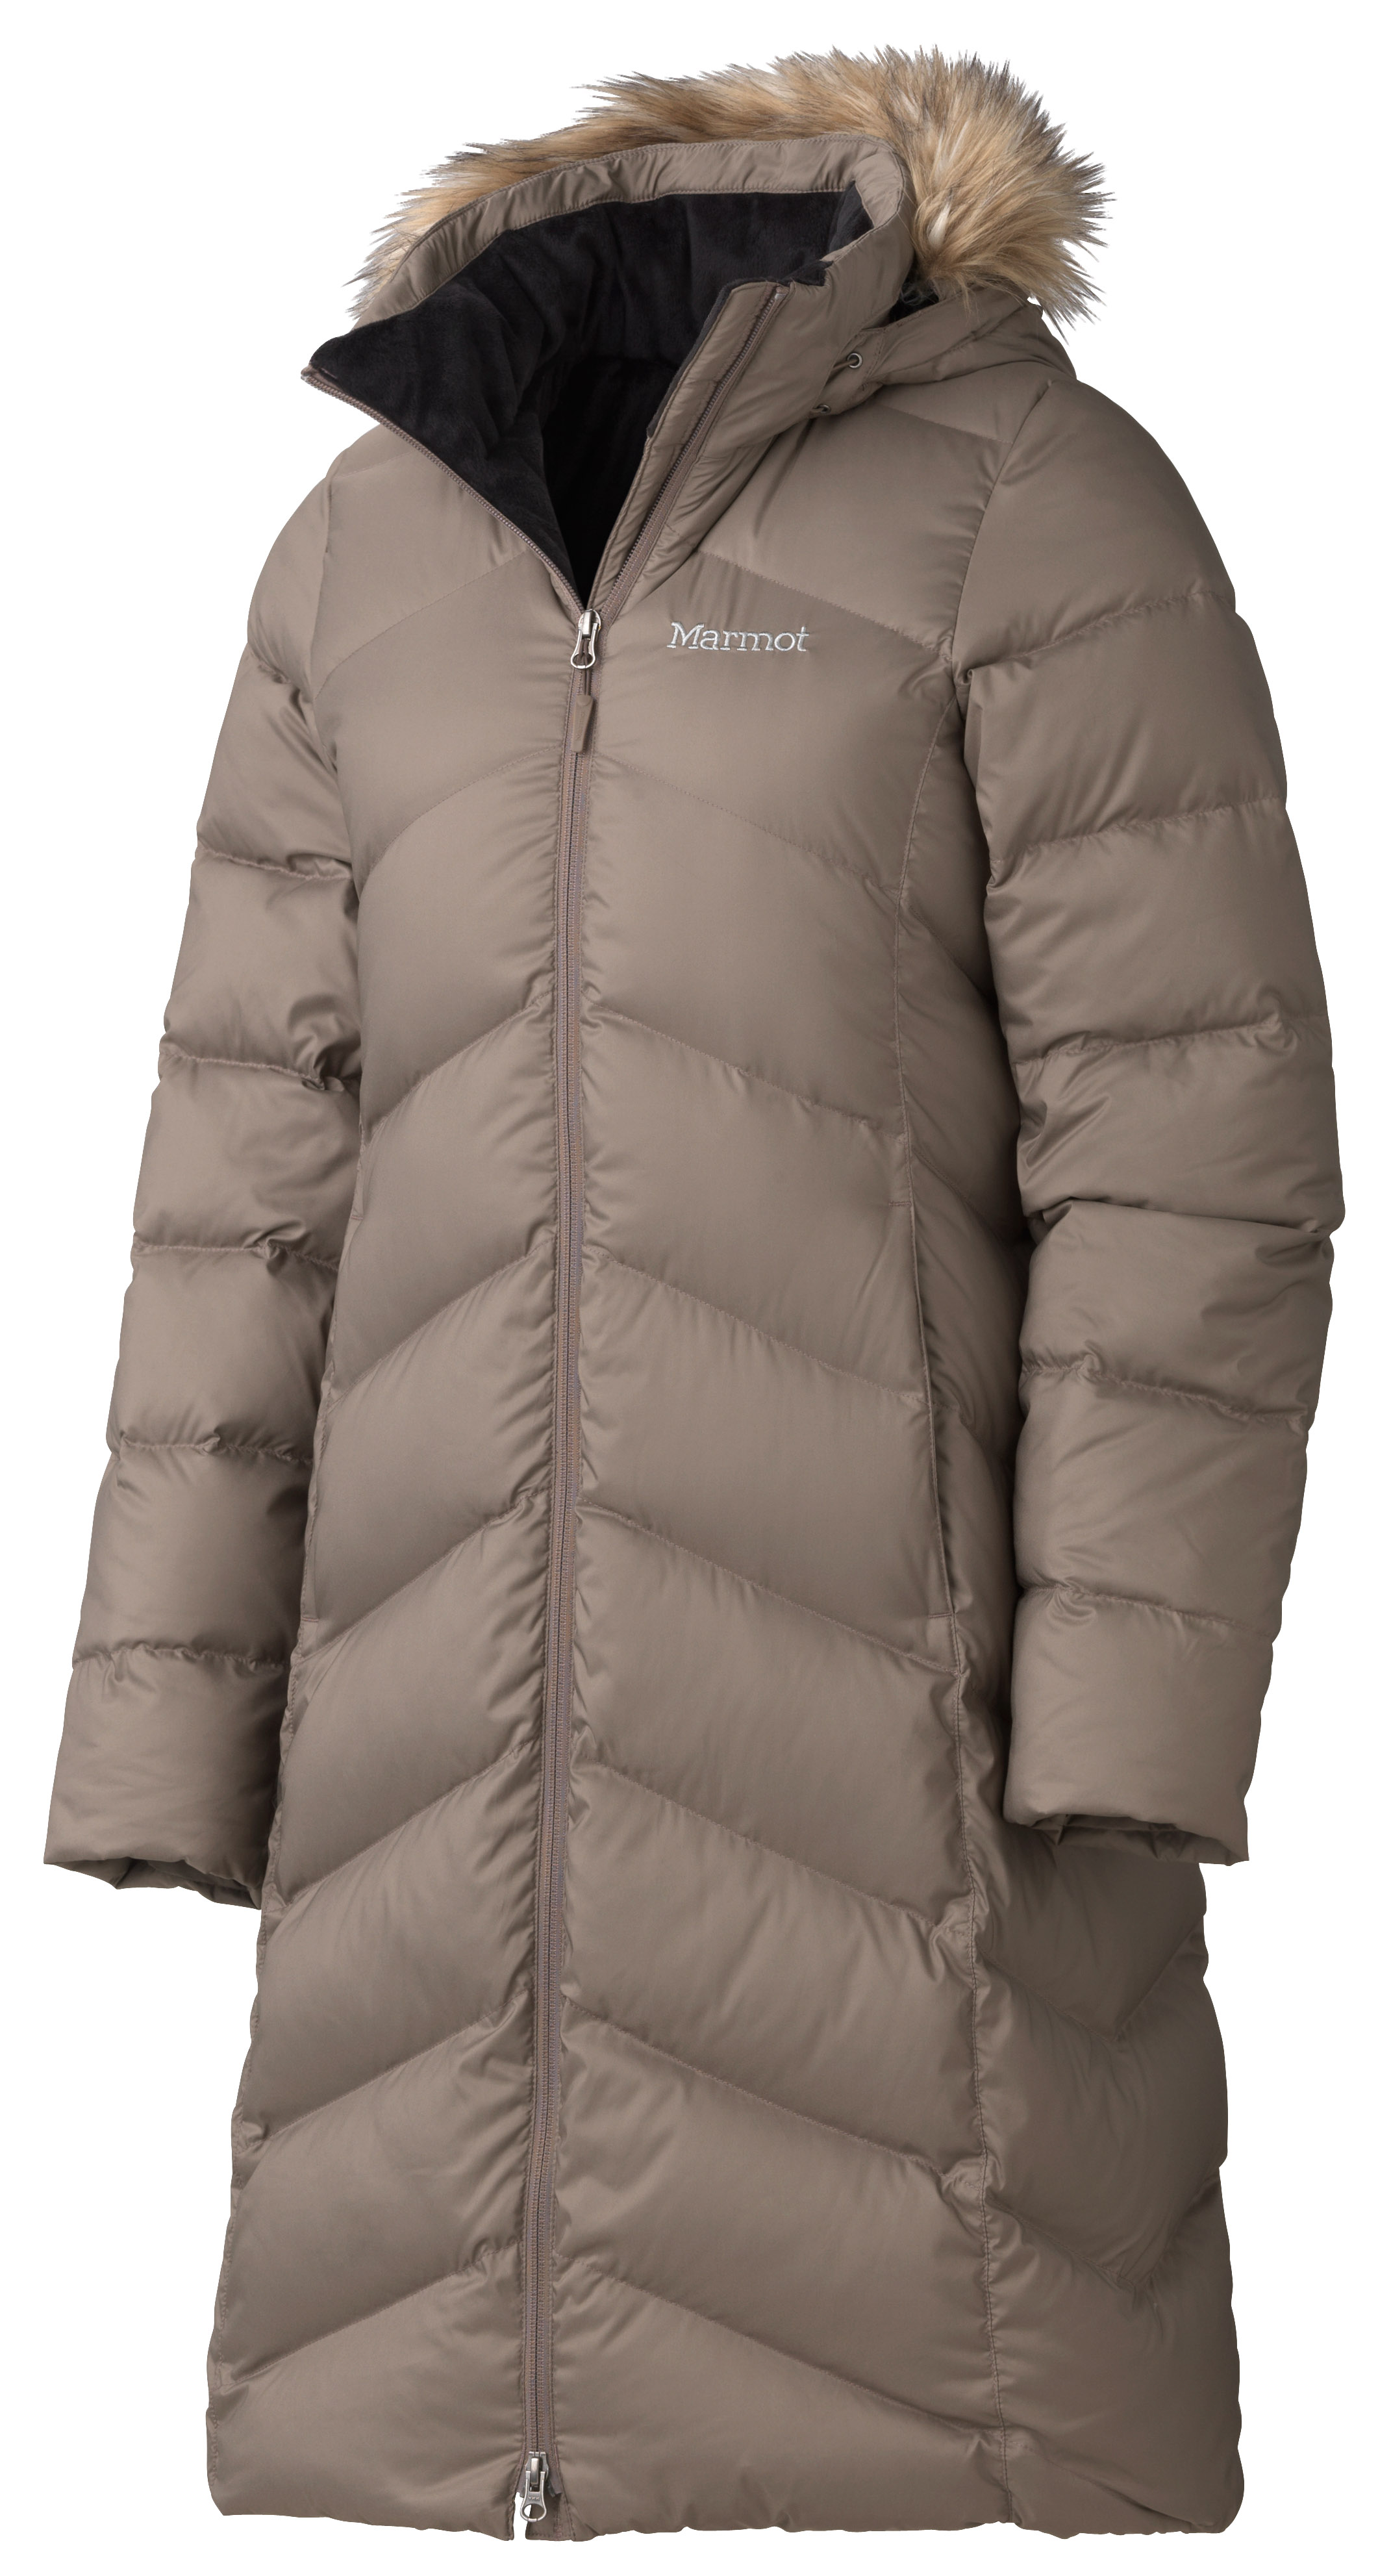 Marmot Montreaux Coat - Womens